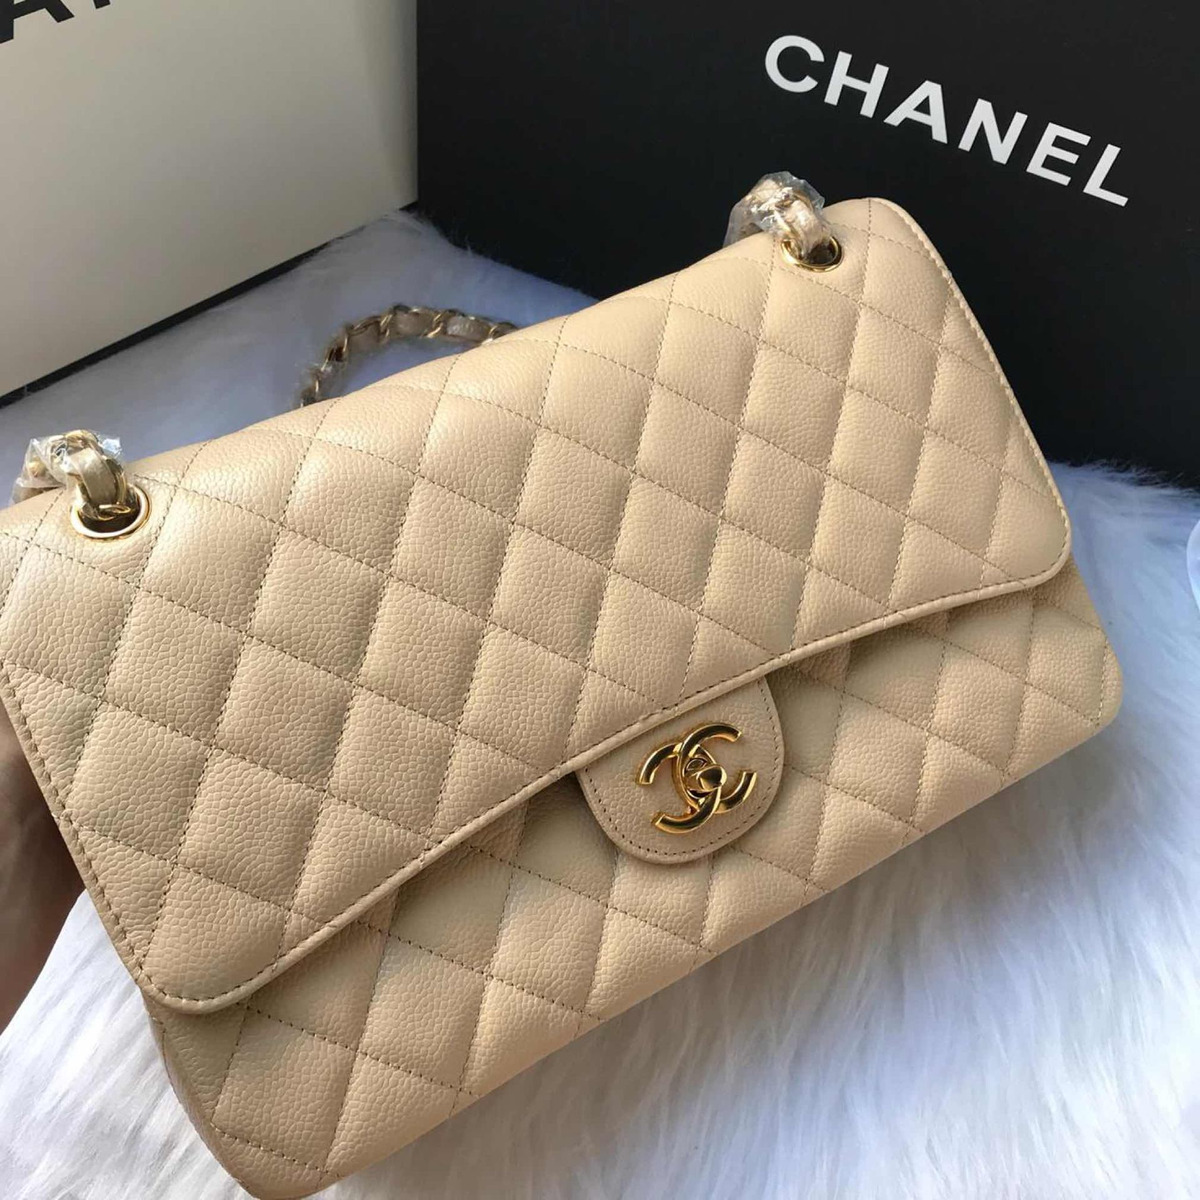 5c585f7a964 Bolsa Chanel Classic Flap Nude - Frete Gratis - R  2.199